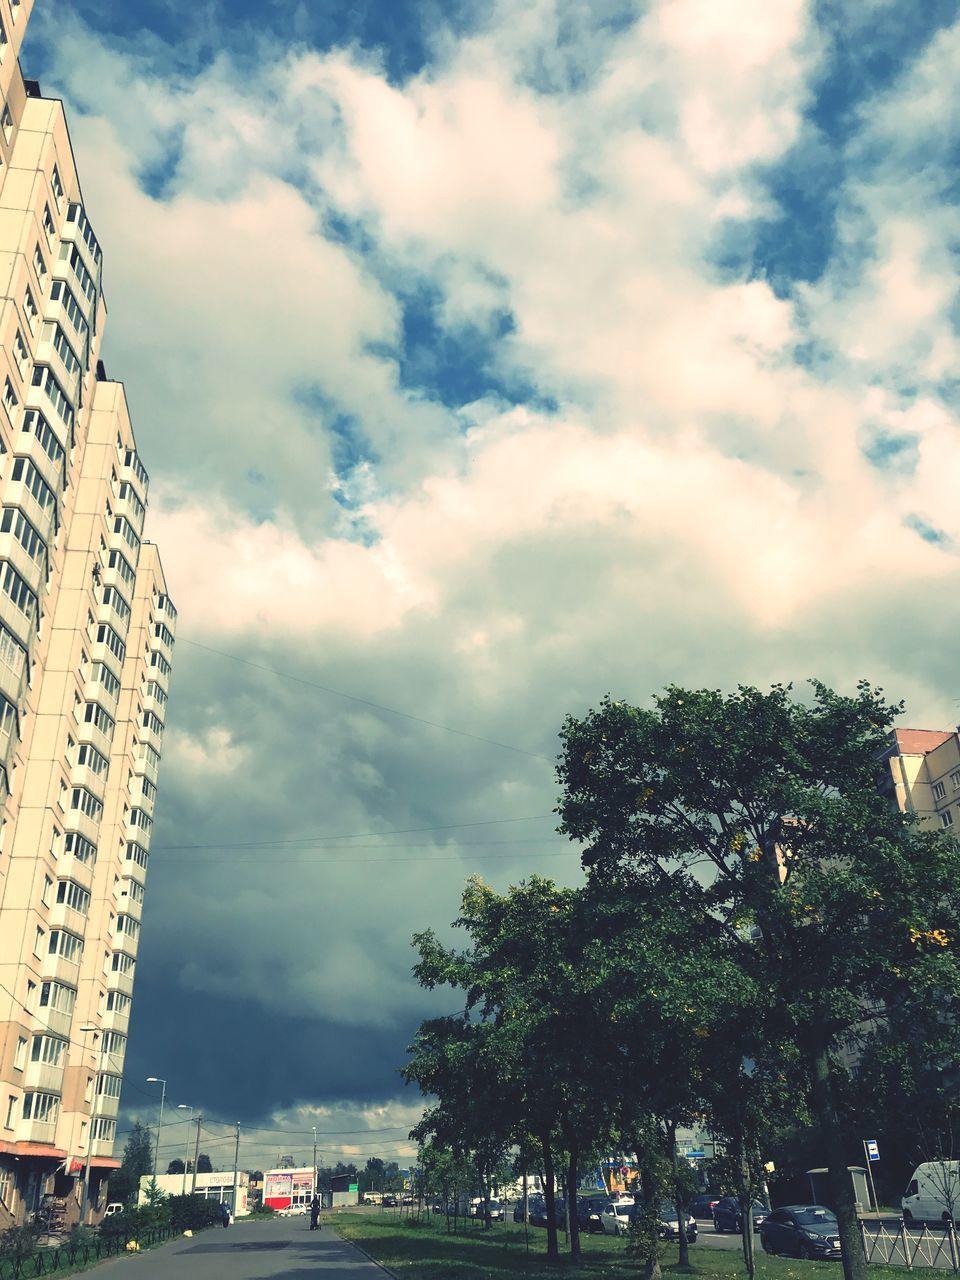 CITY STREET BY PALM TREE AGAINST SKY